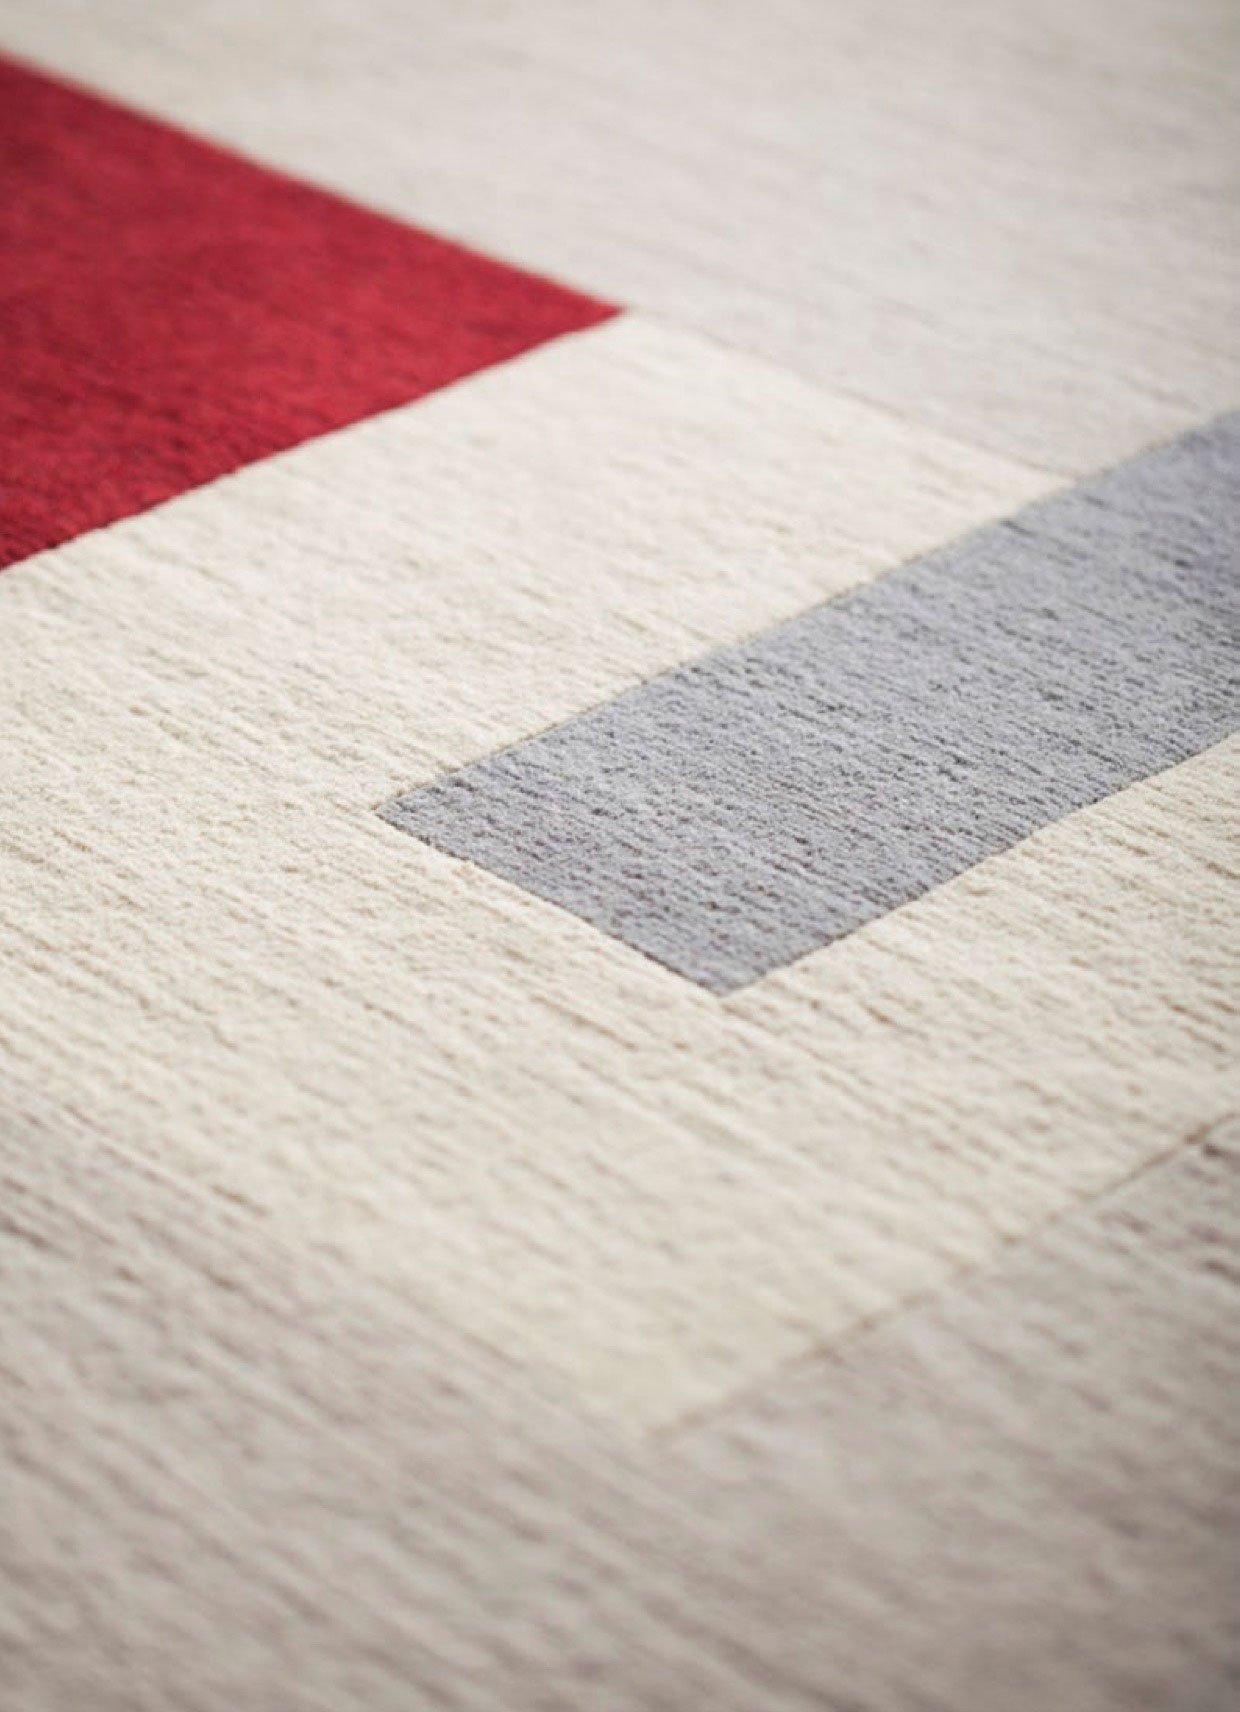 LaDatina_handmade_carpets_Manlio_Rho